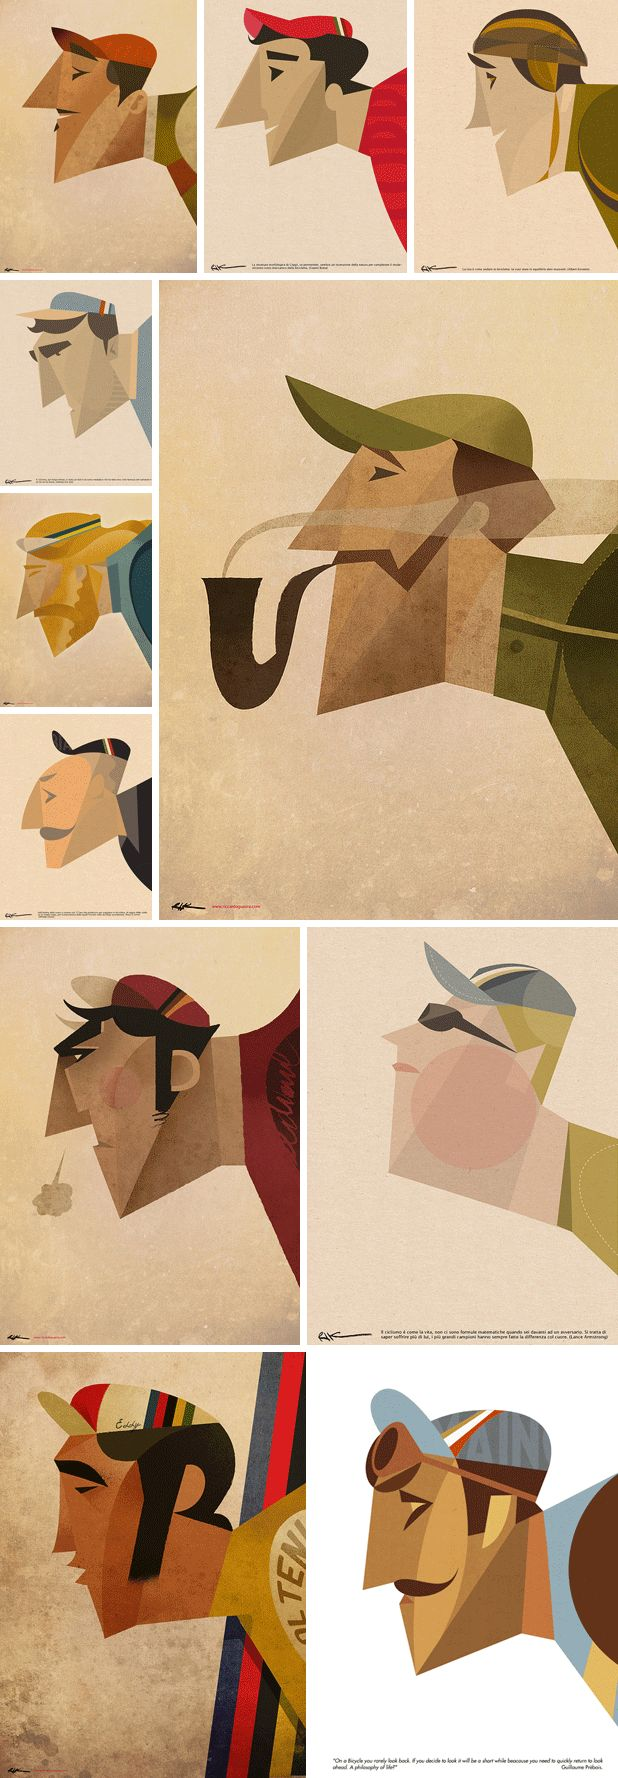 Dream team cyclist illustrations by Riccardo Guasco  #poster #flat #illustration…